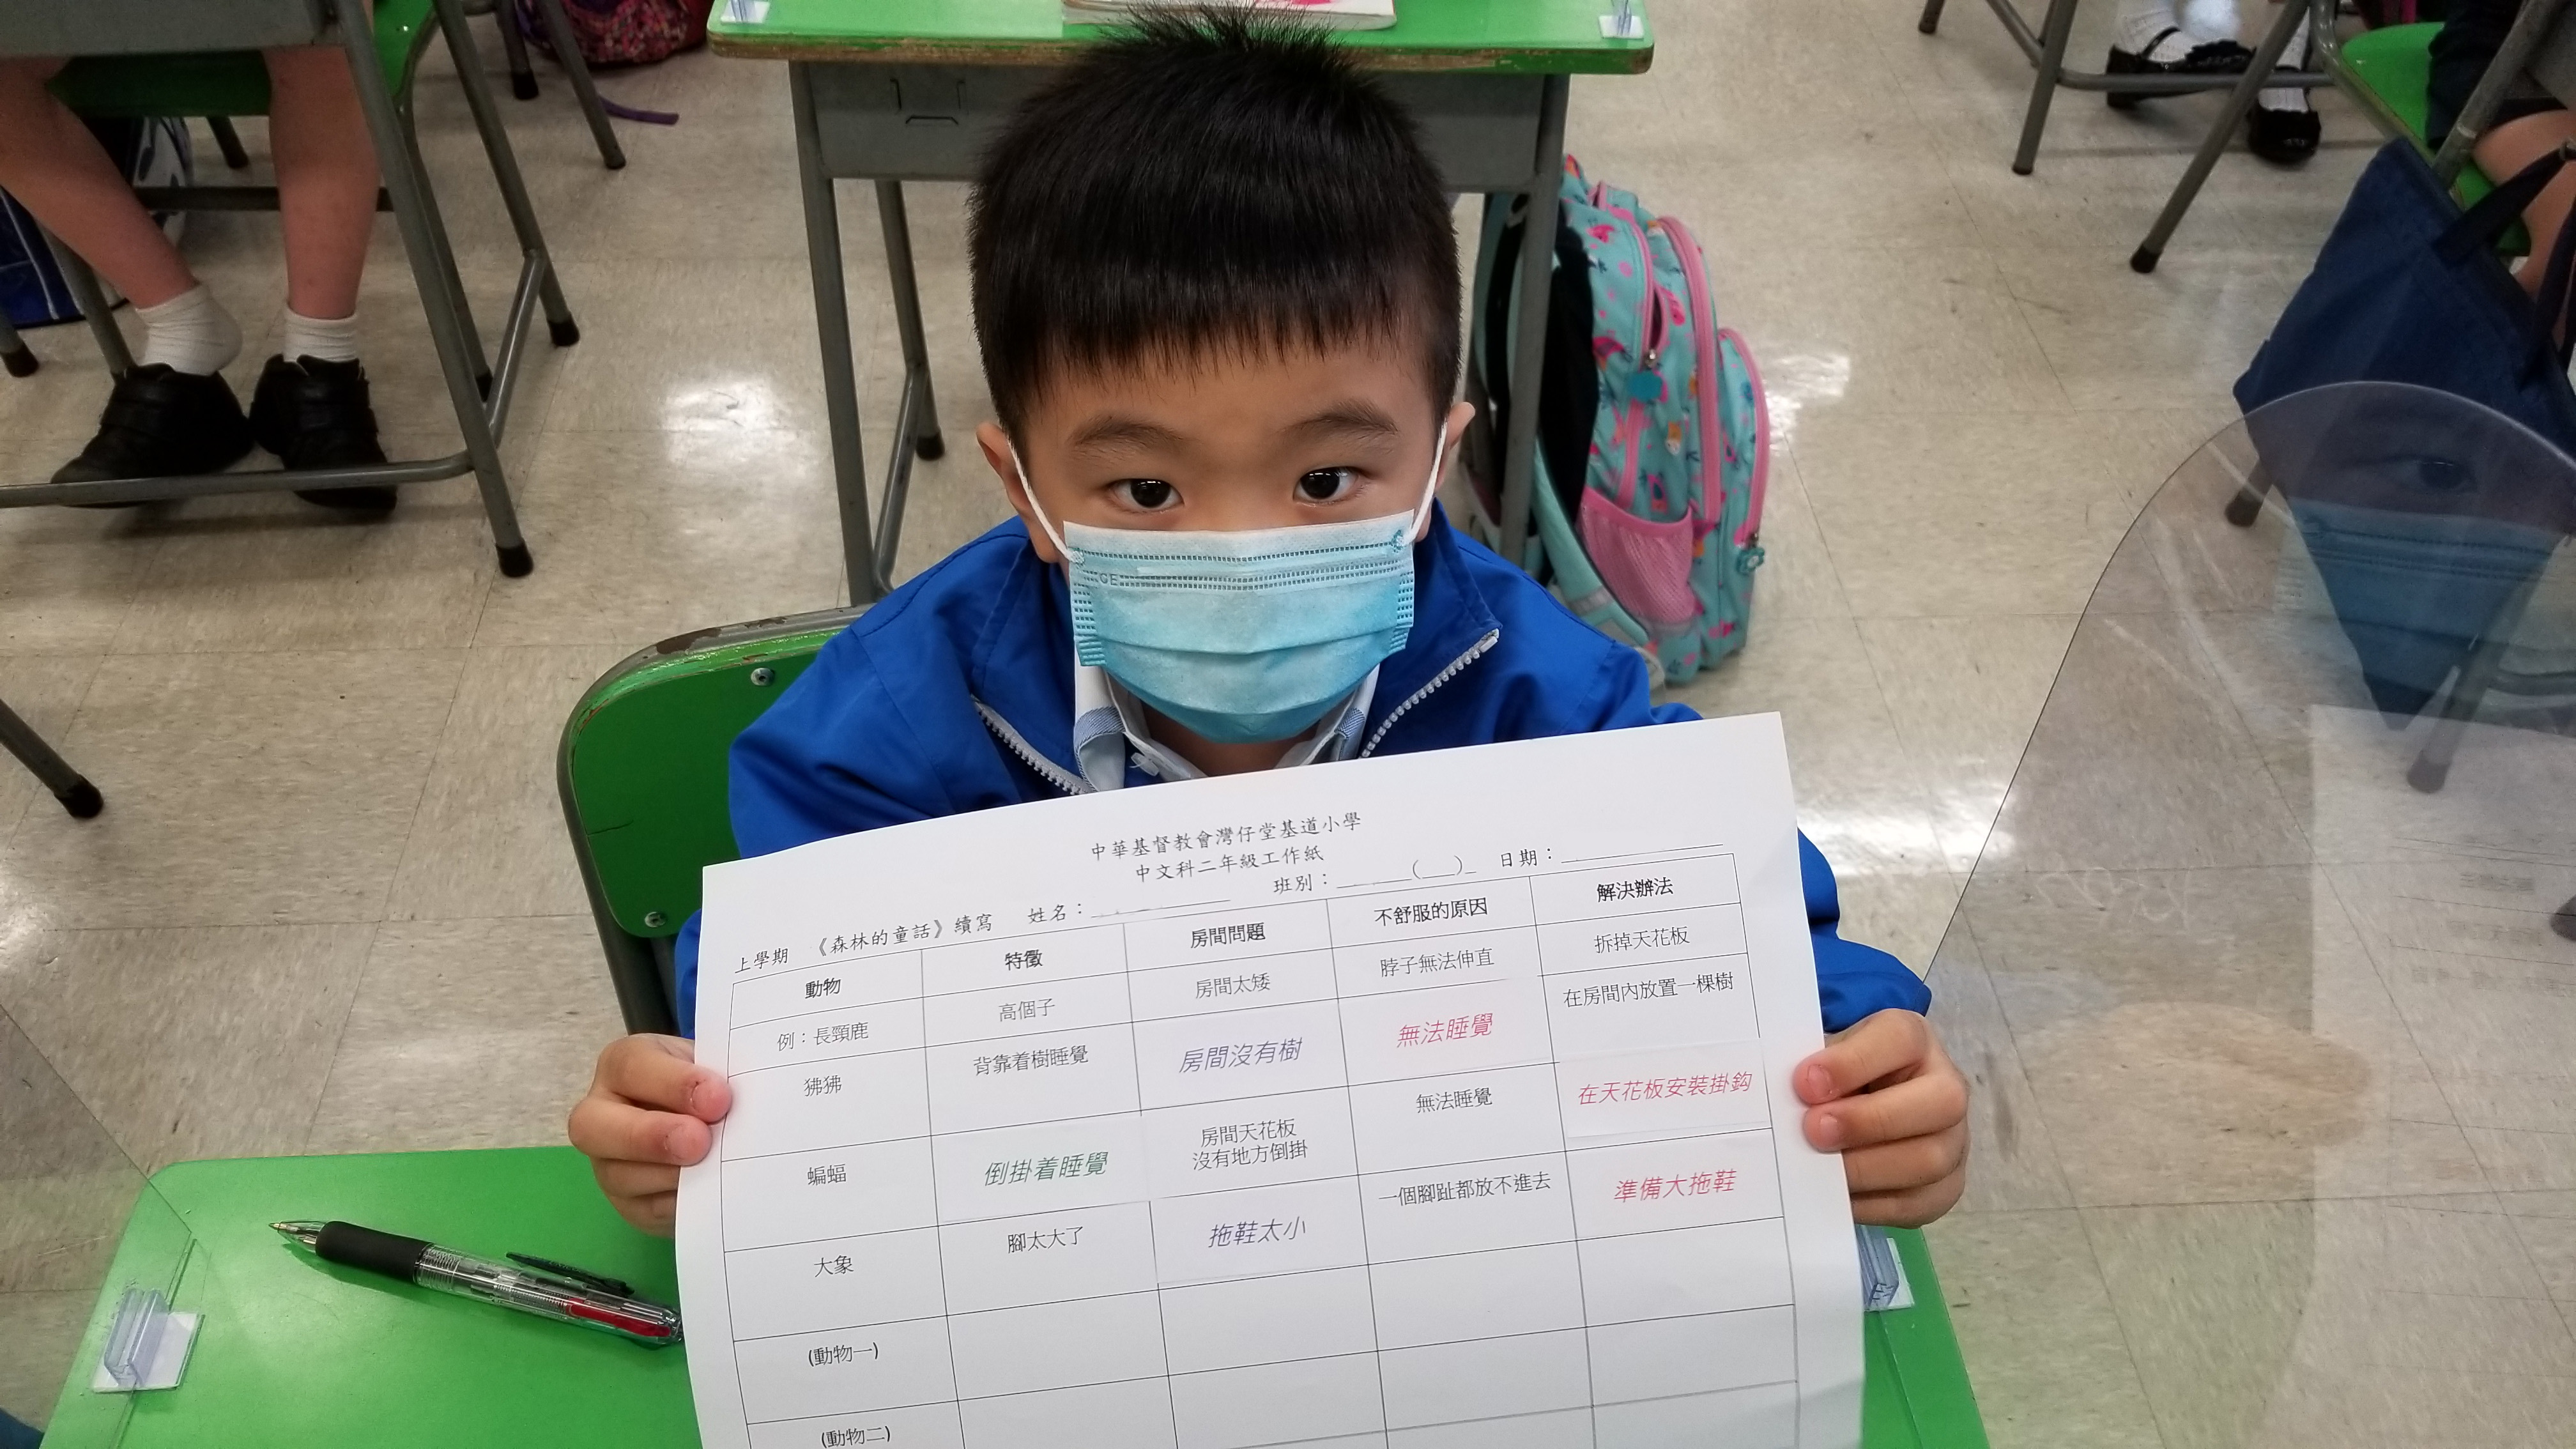 http://keito.school.hk/sites/default/files/20201015_0853371.jpg